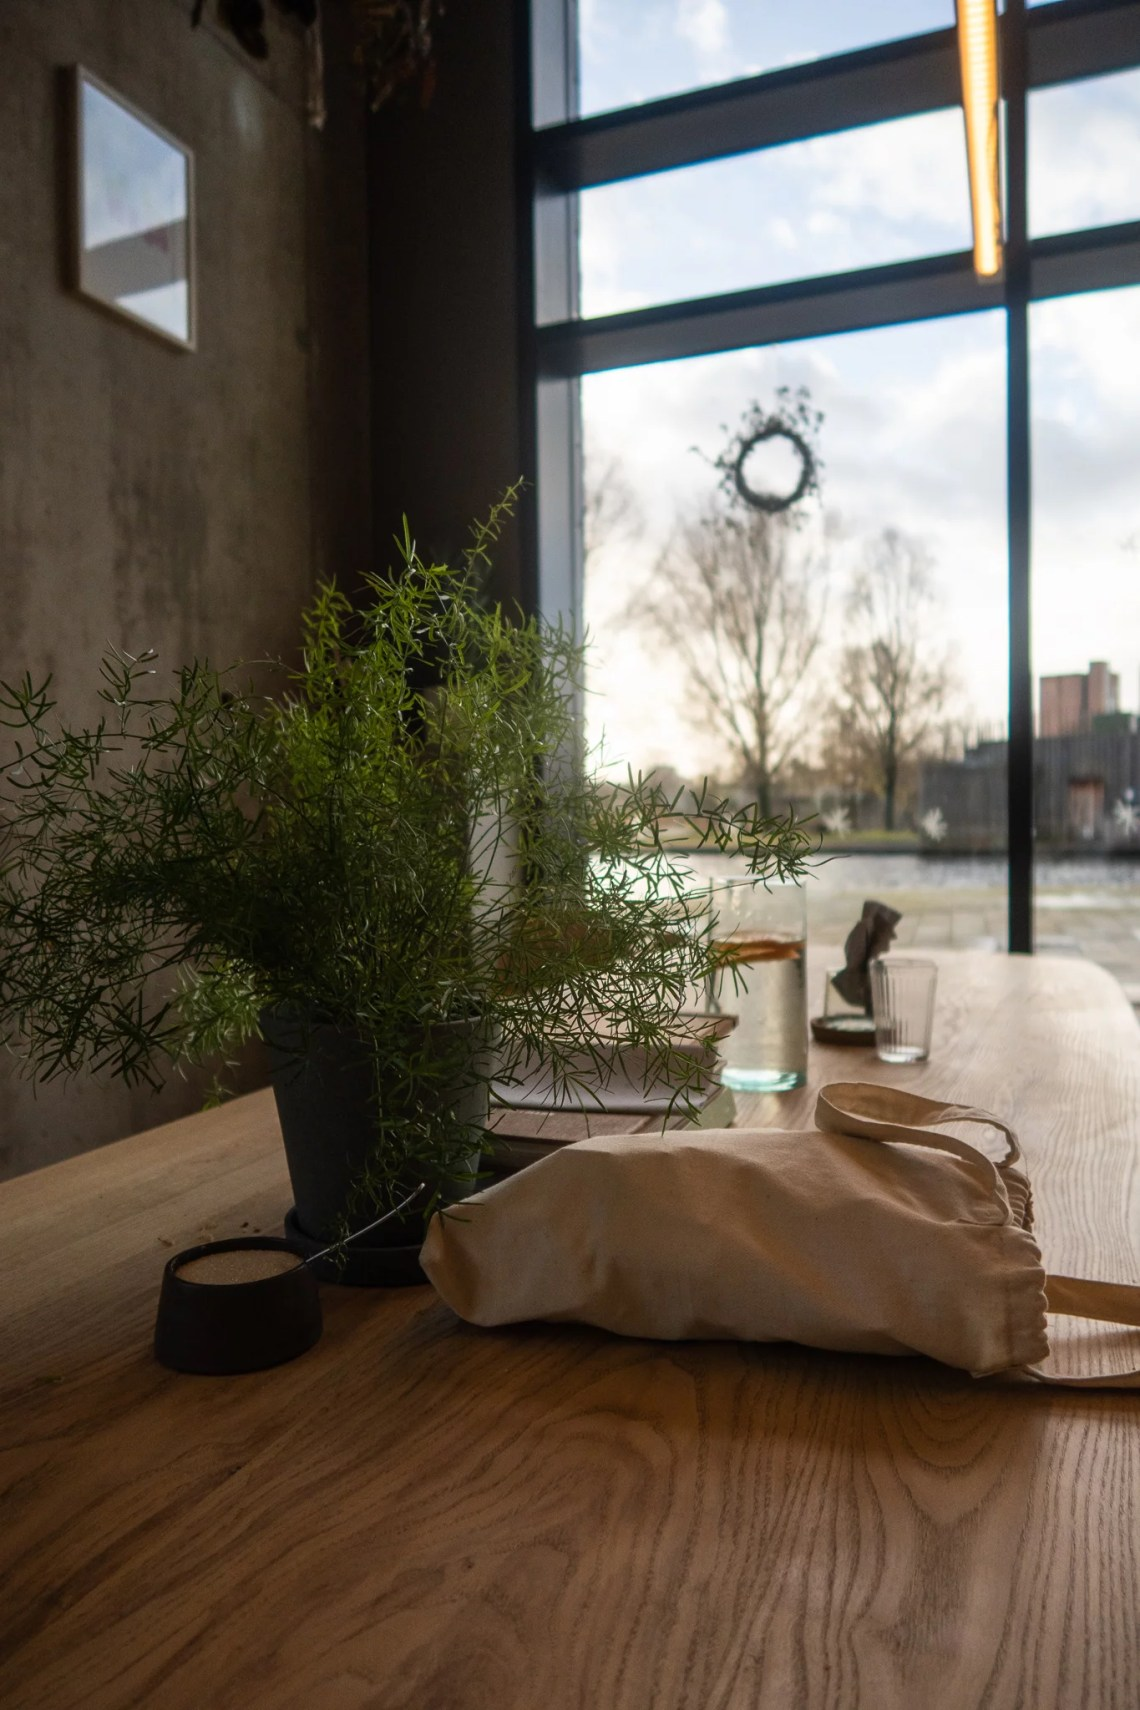 Pollen Bakery table